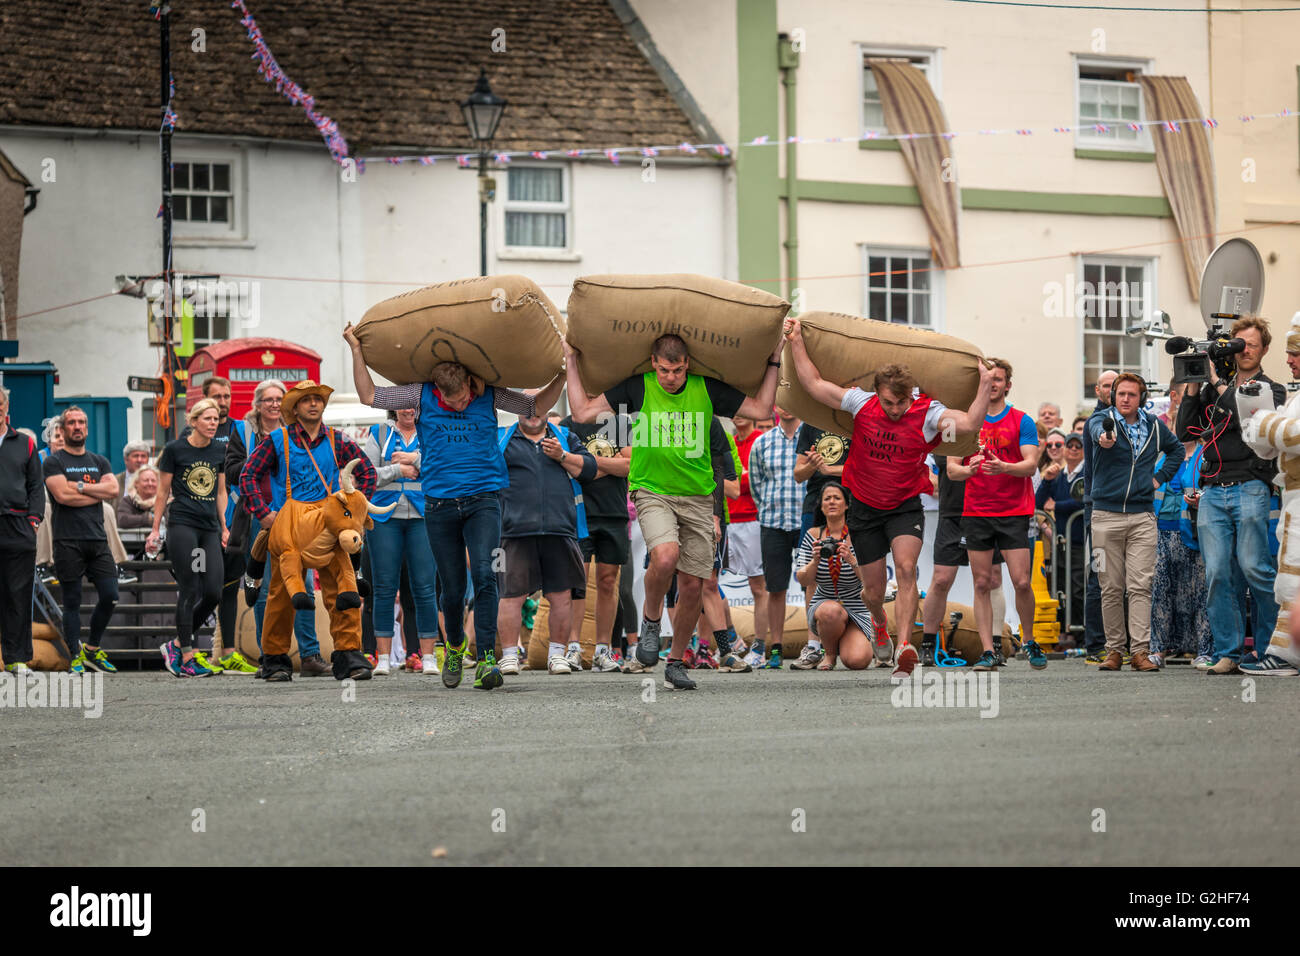 Tetbury Woolsack Races 2016 - Stock Image